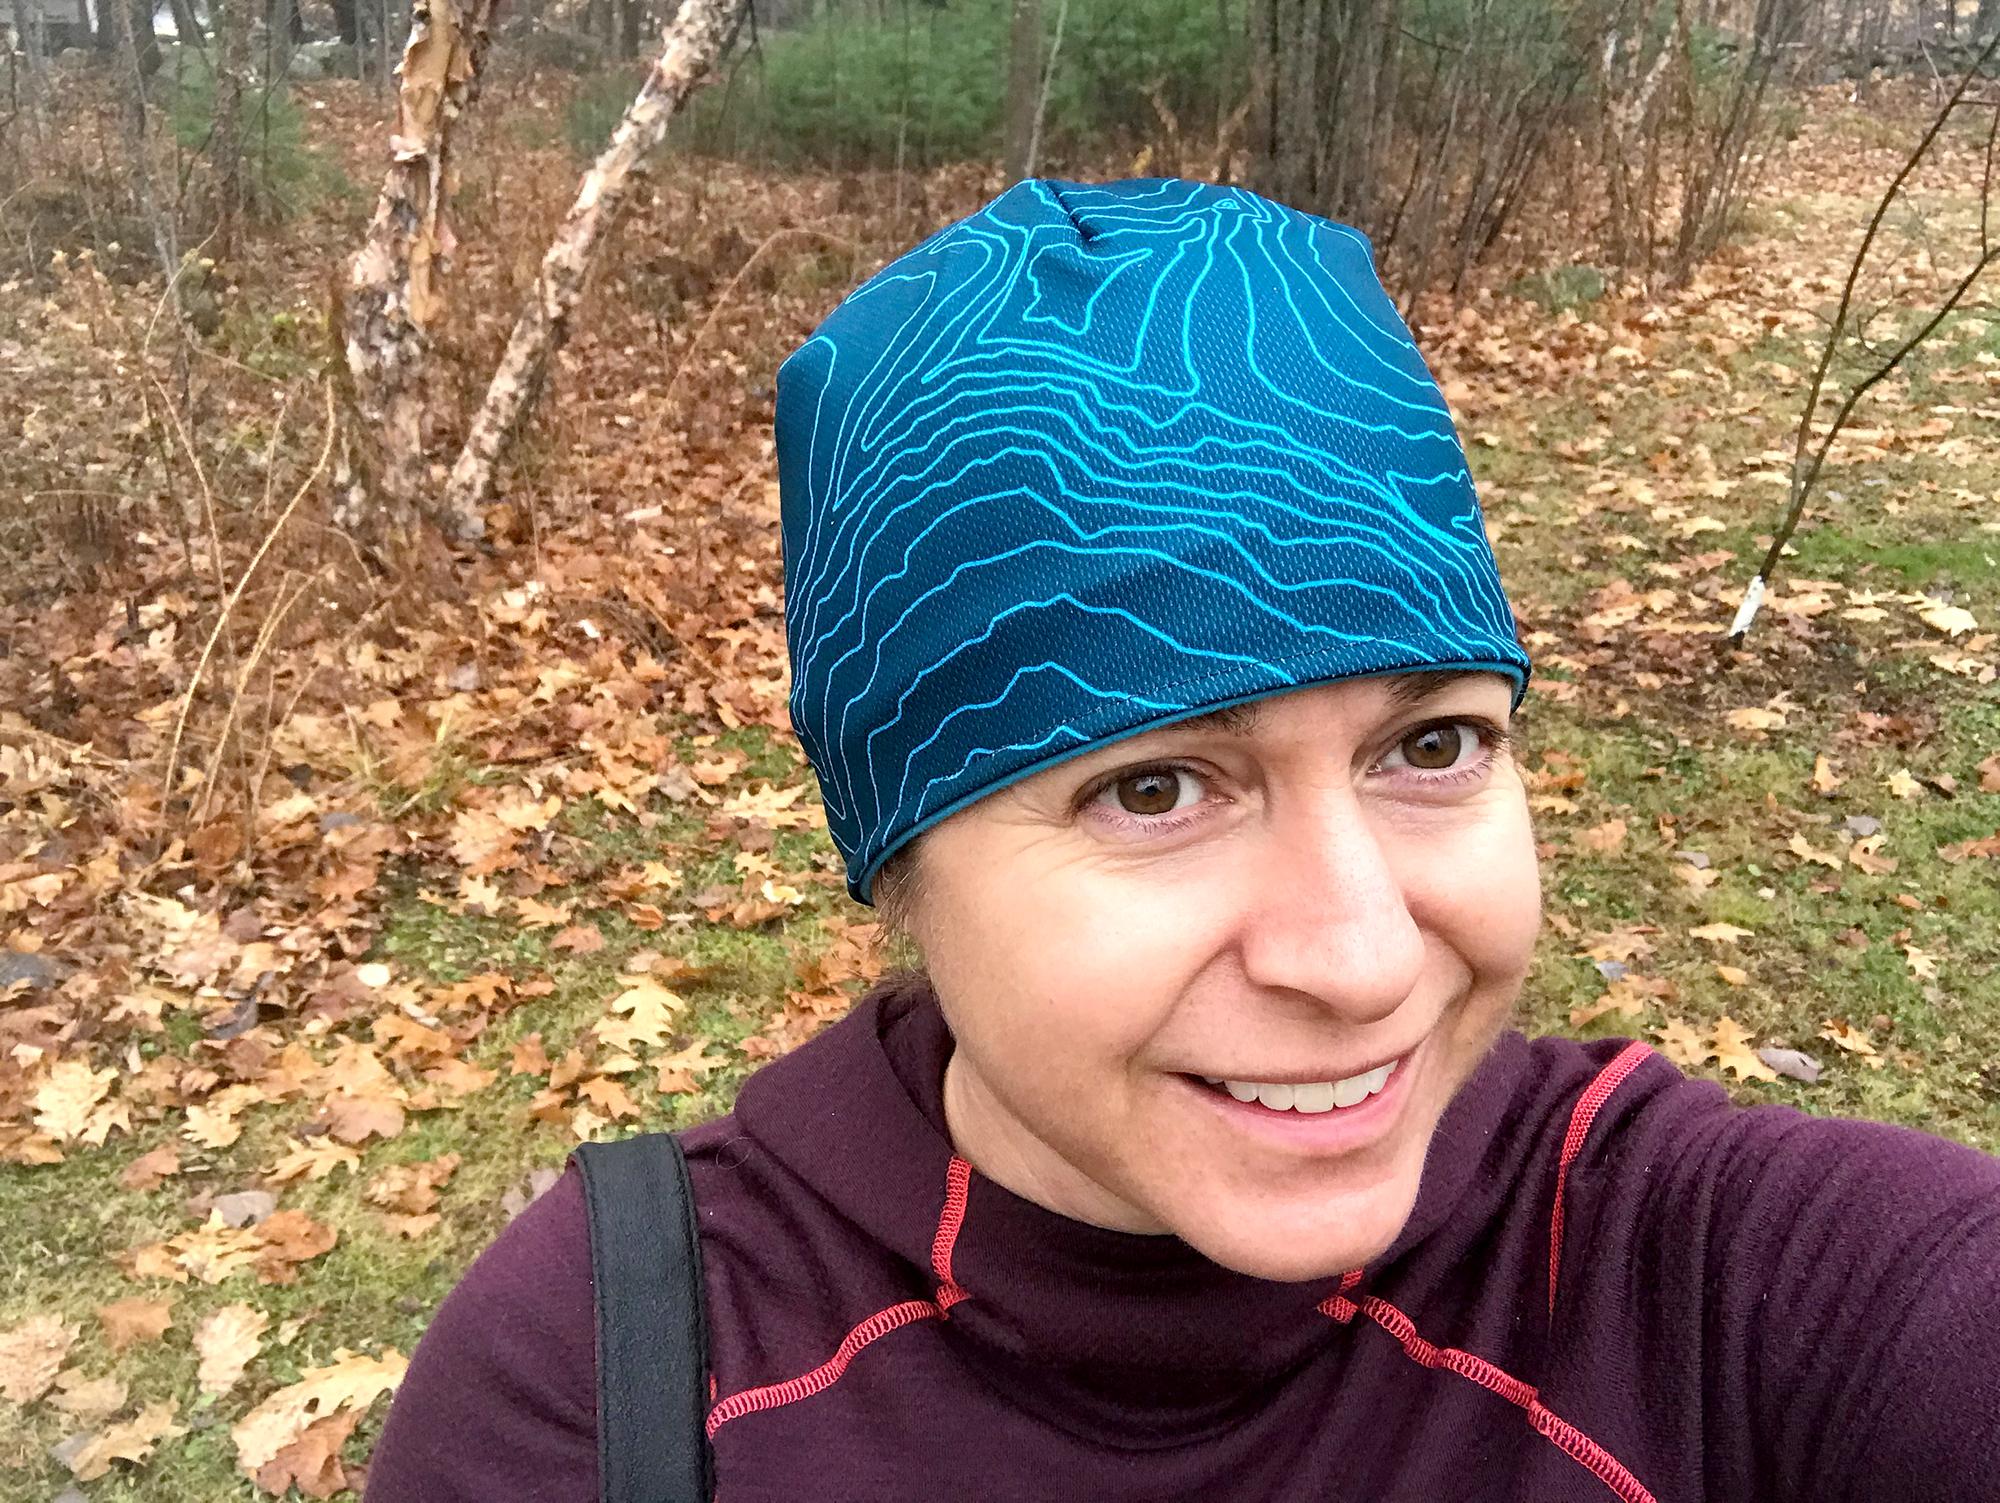 photo: NativesOutdoors White Shell Mountain Beanie winter hat